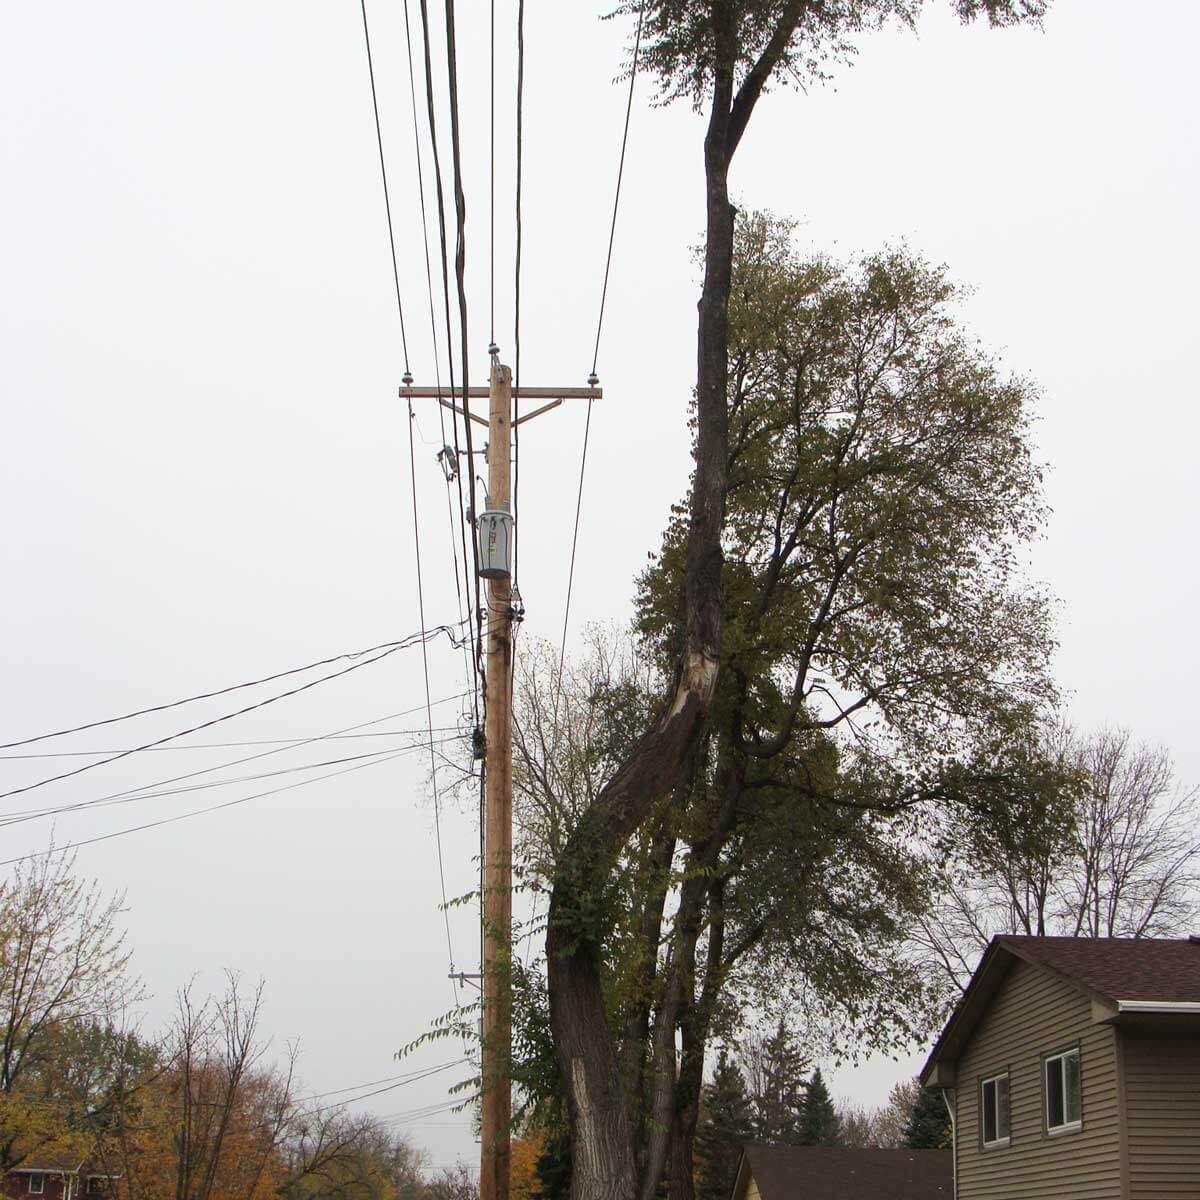 Republican tree?